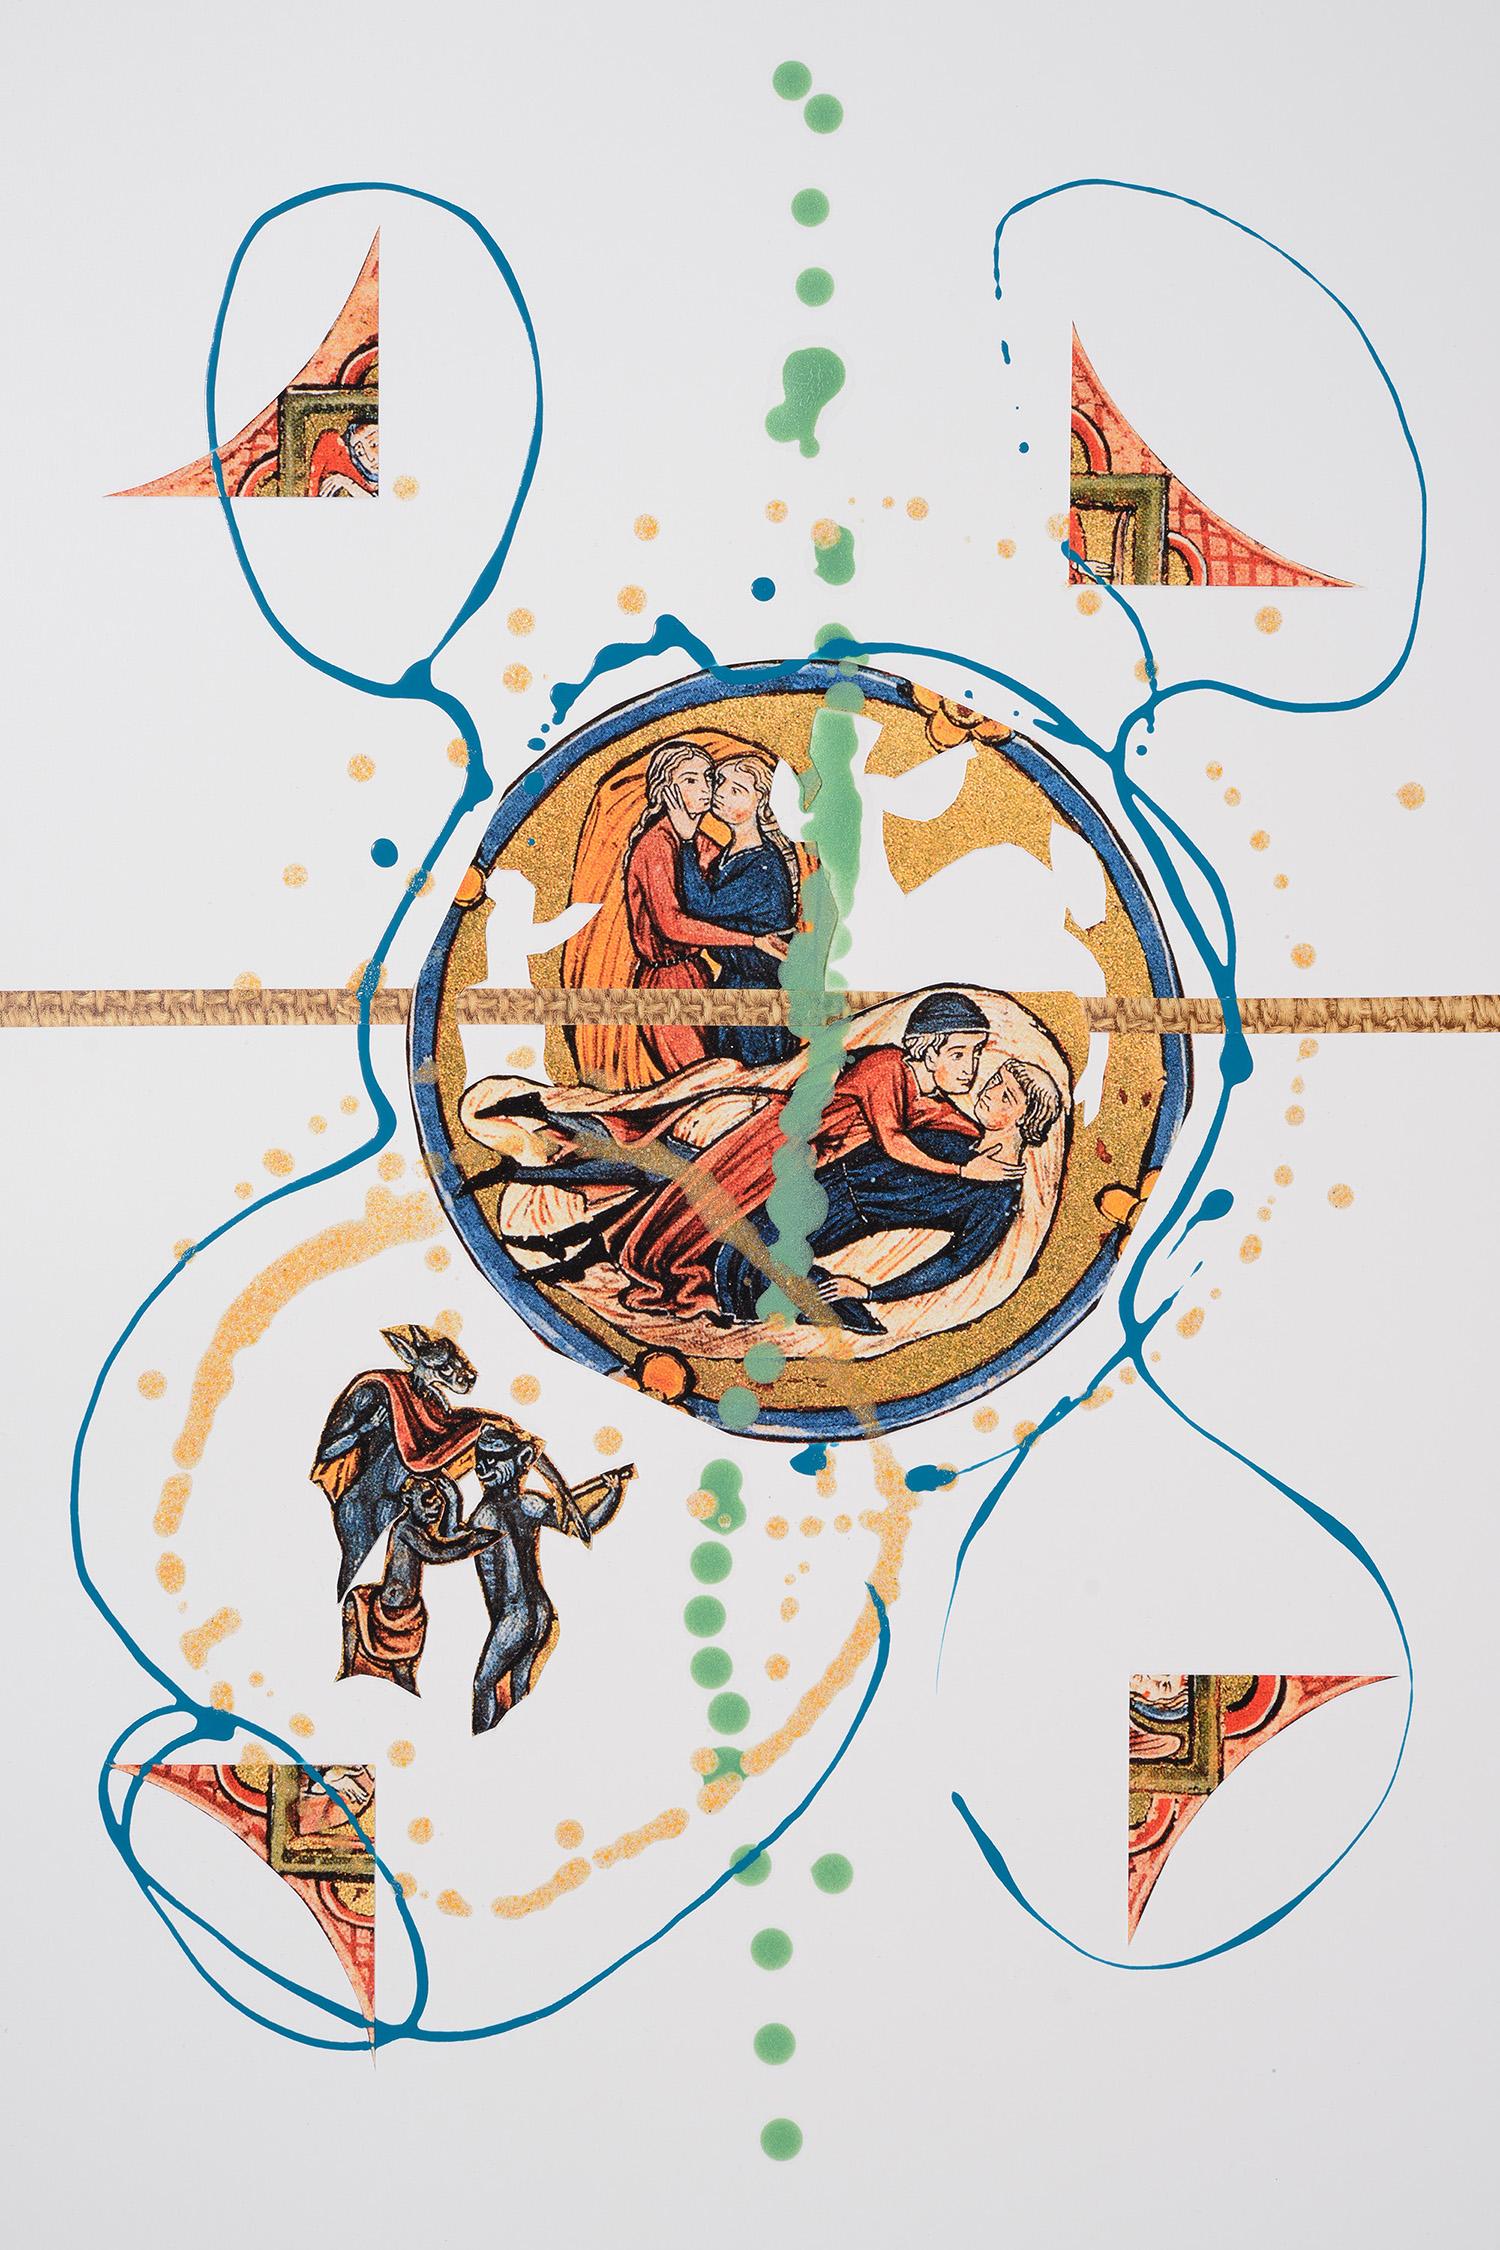 Markues, LetΓÇÖs Get Lost, 2014, mixed media on paper, 60 x 40 cm.jpg